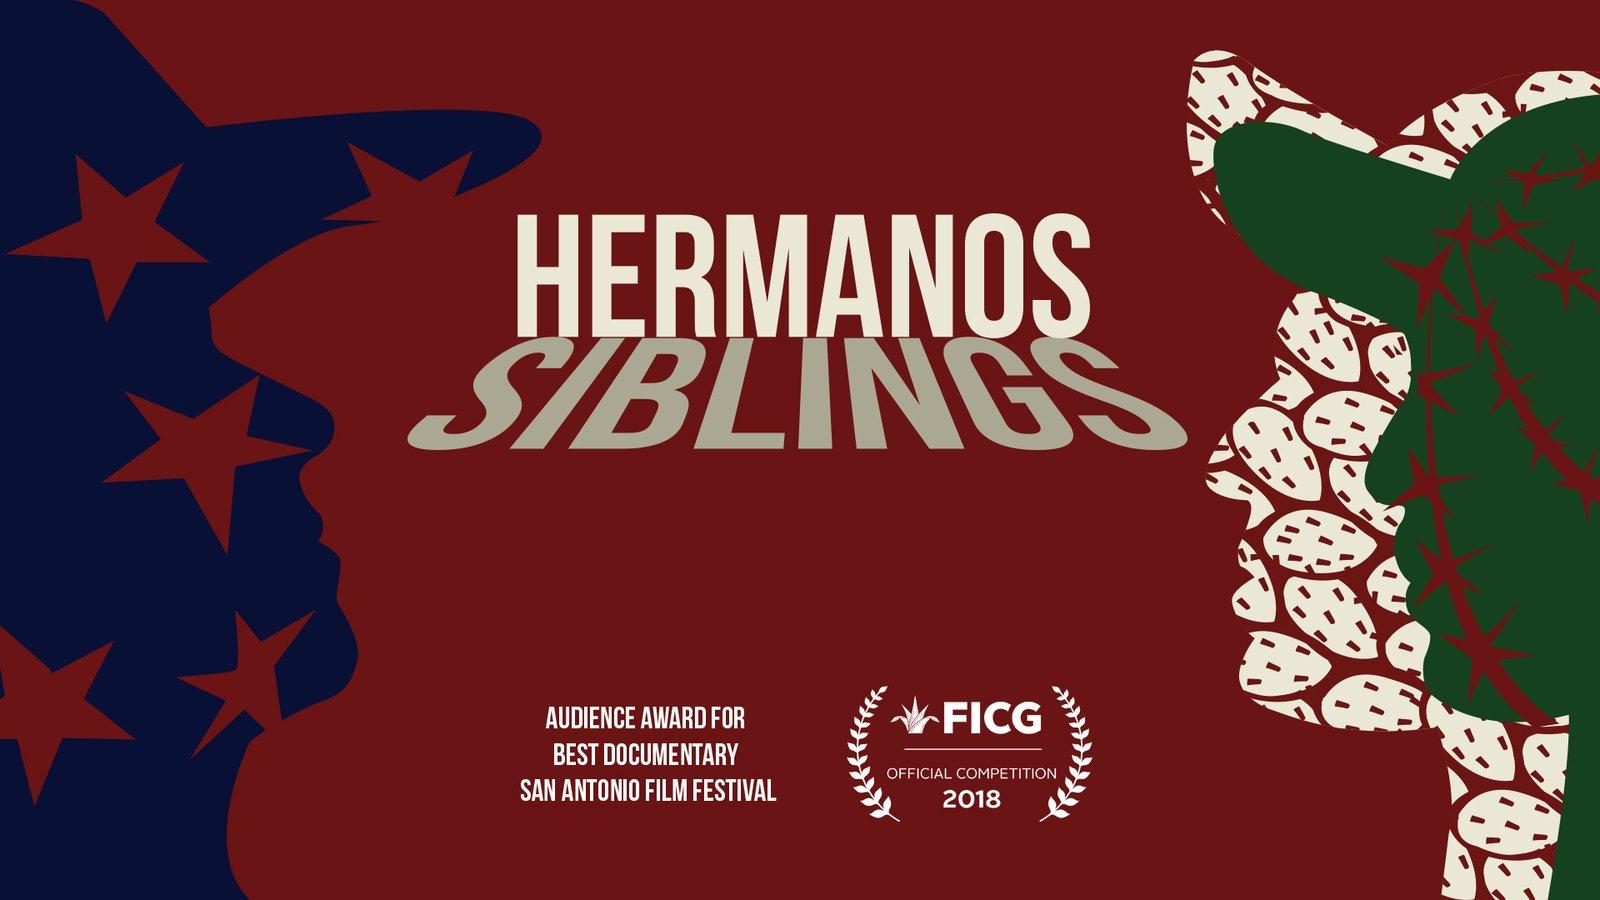 Hermanos - Siblings - The American Dream Beyond the Wall